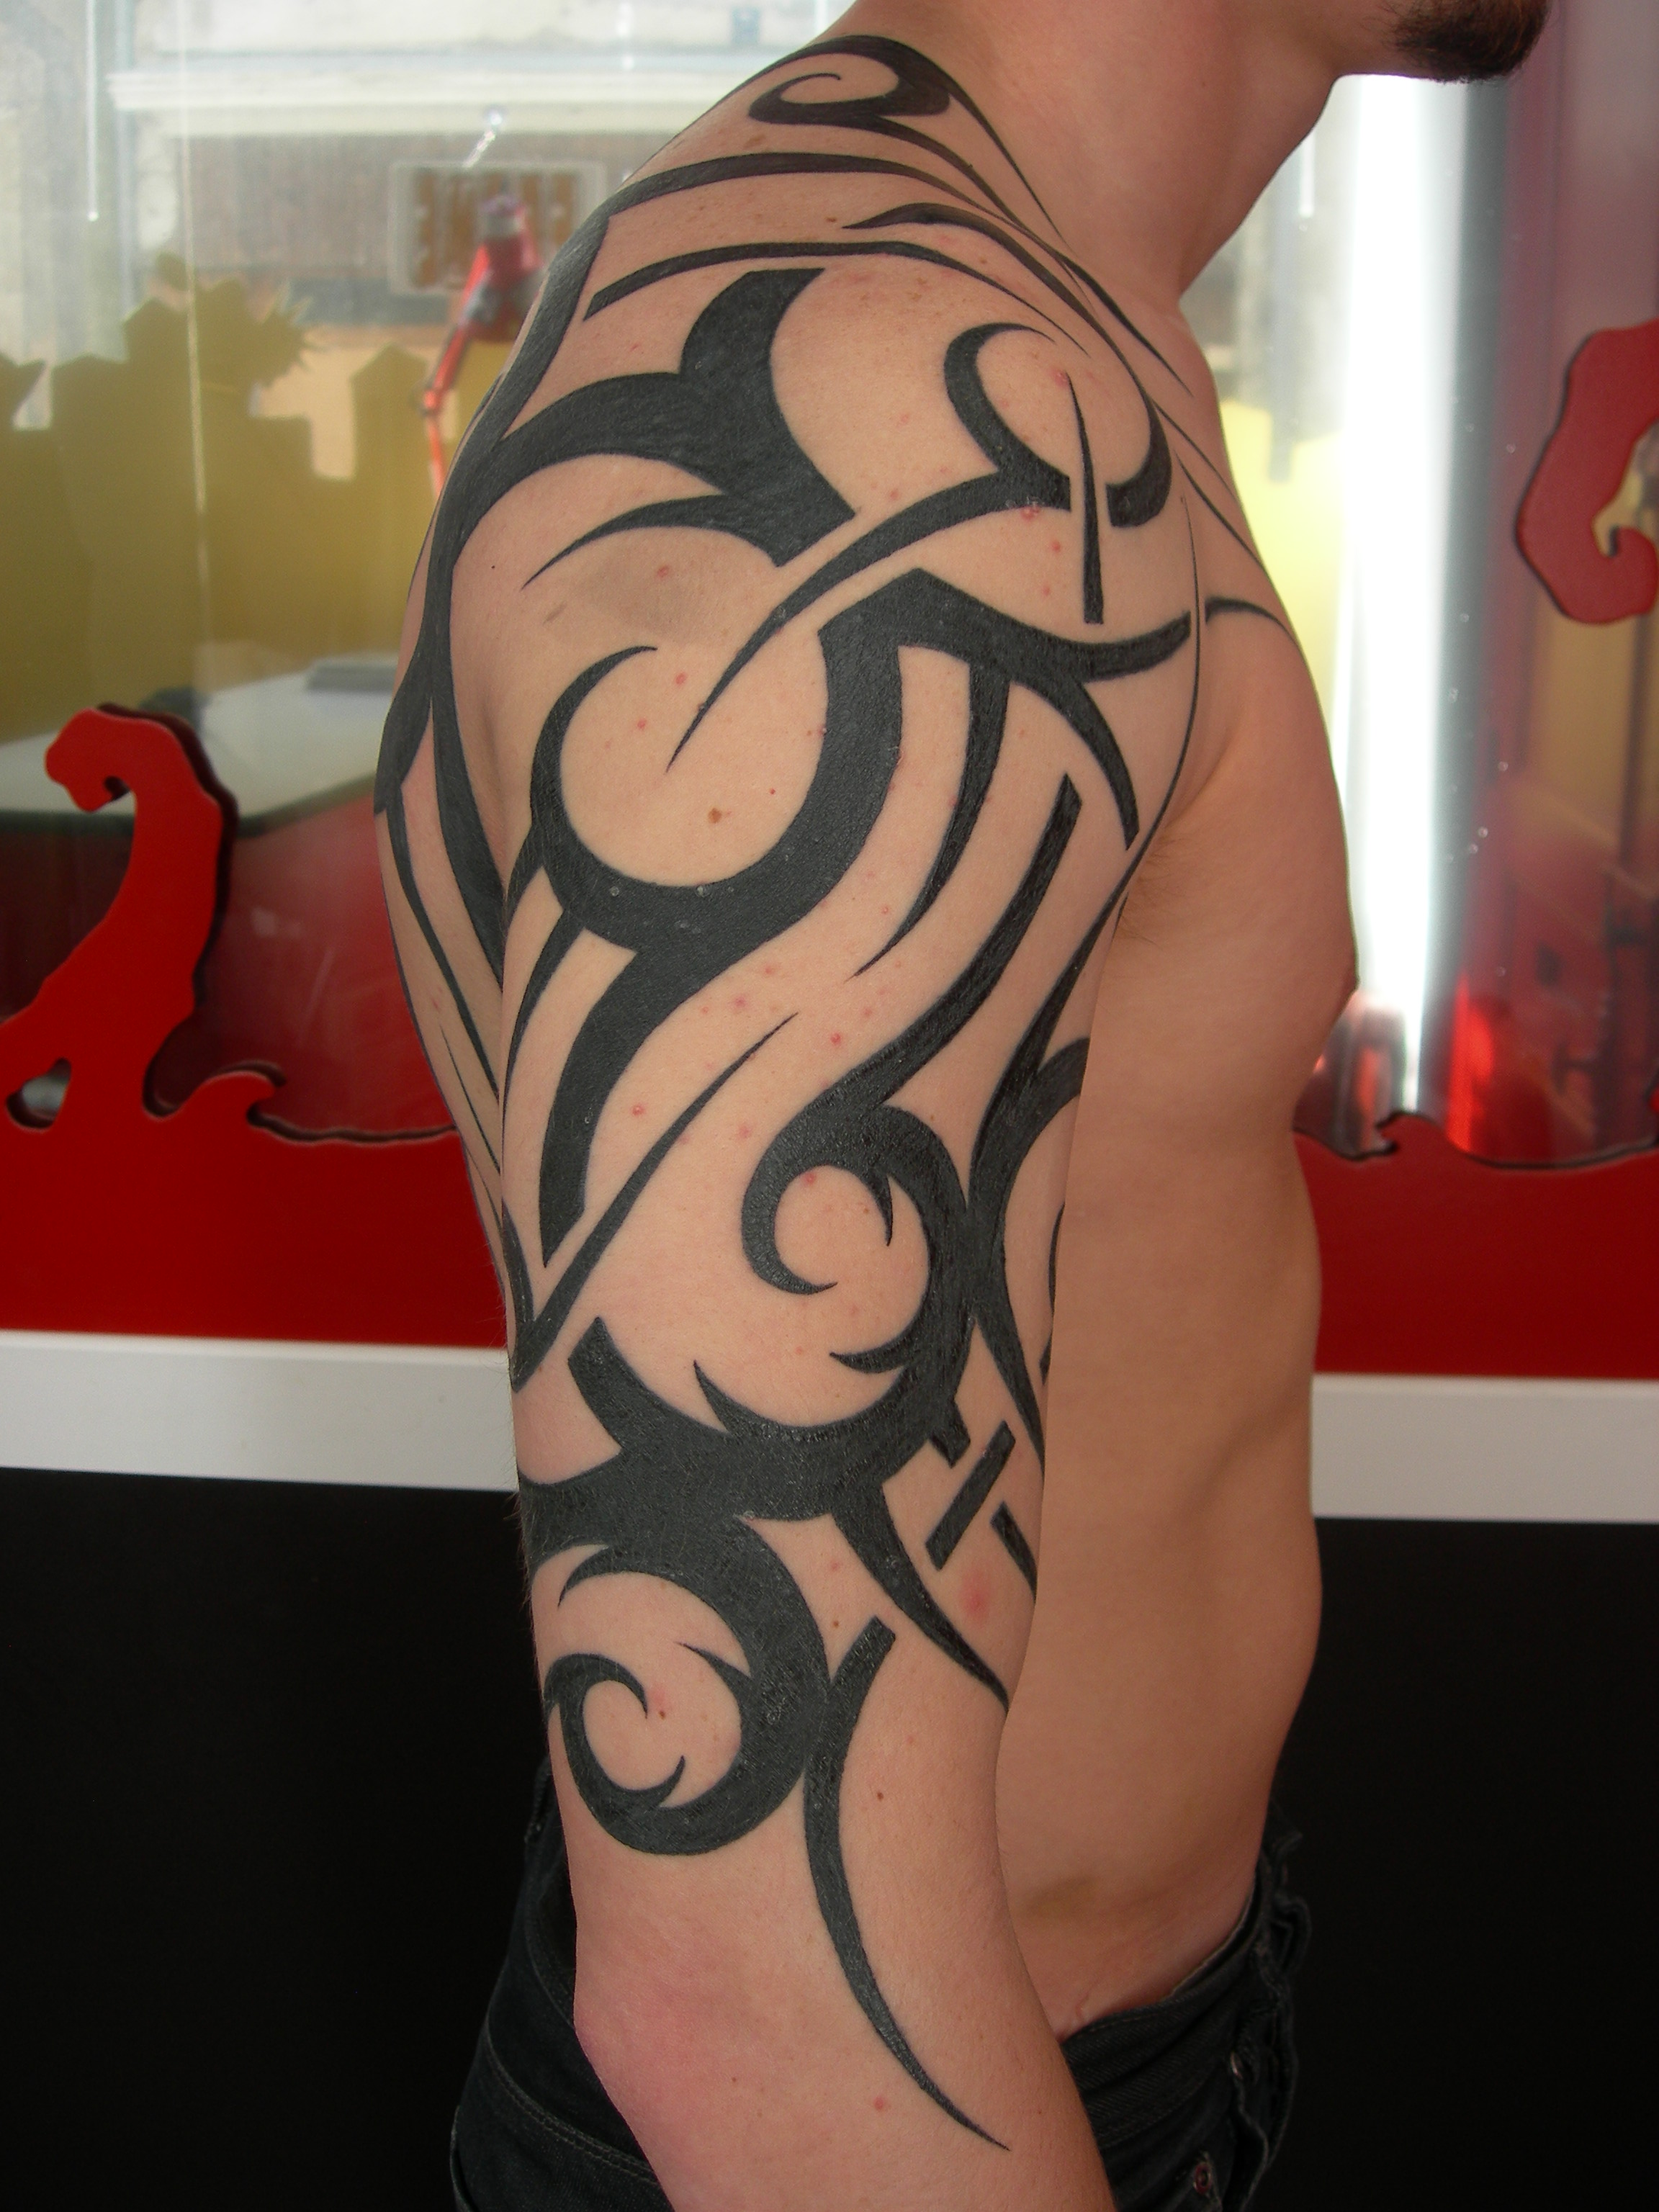 Wonderful Tatouage Epaule Et Bras #11: Tatouage Tribalajo Sur épaule Bras. «